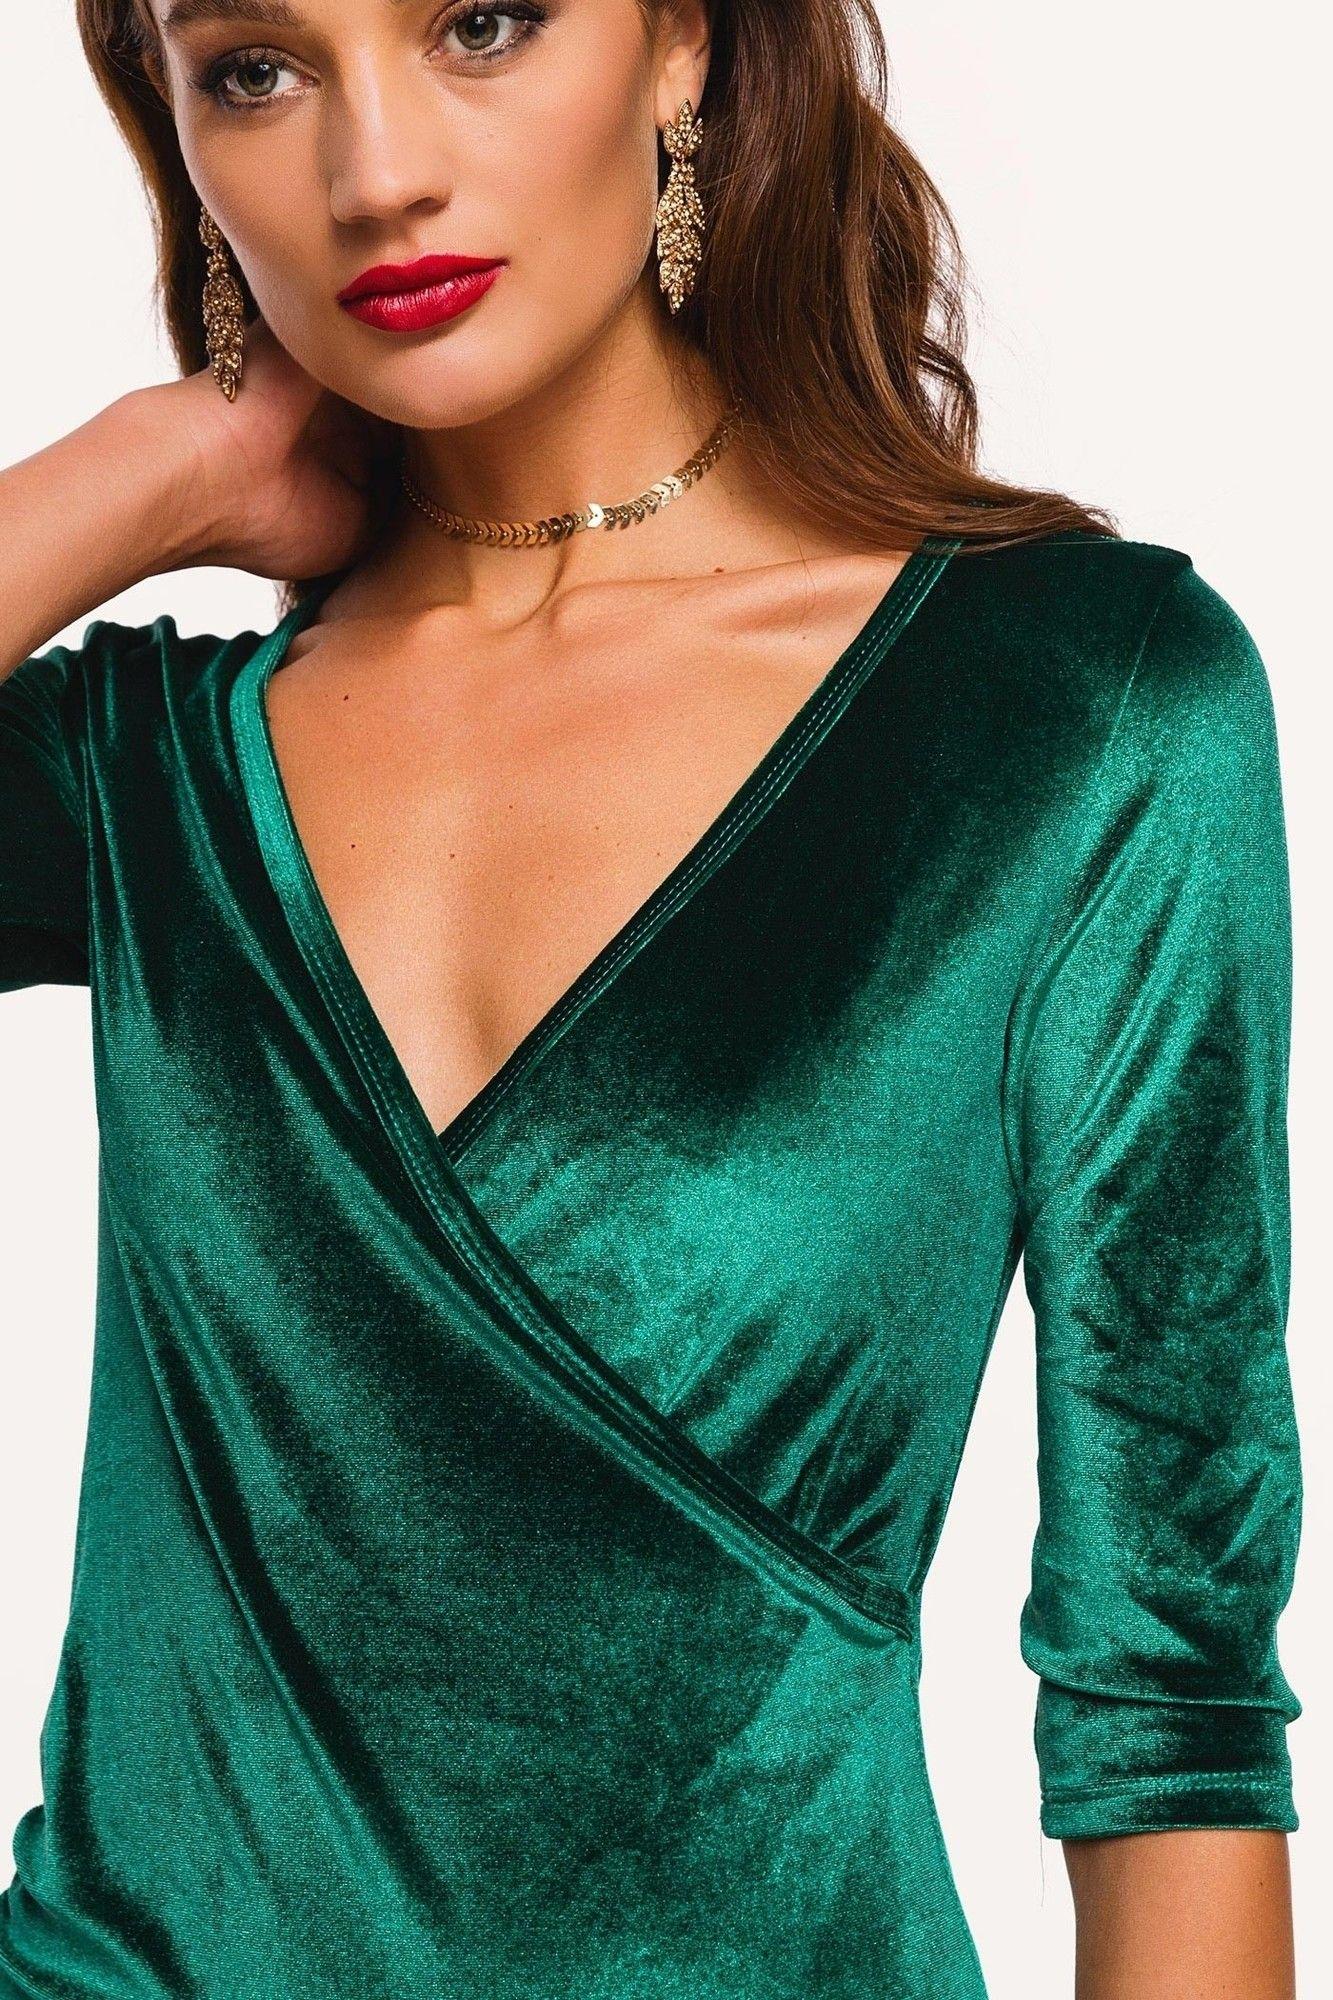 0c27e84f Loavies green velvet dress | Fashion Webshop LOAVIES | Hairstyles ...